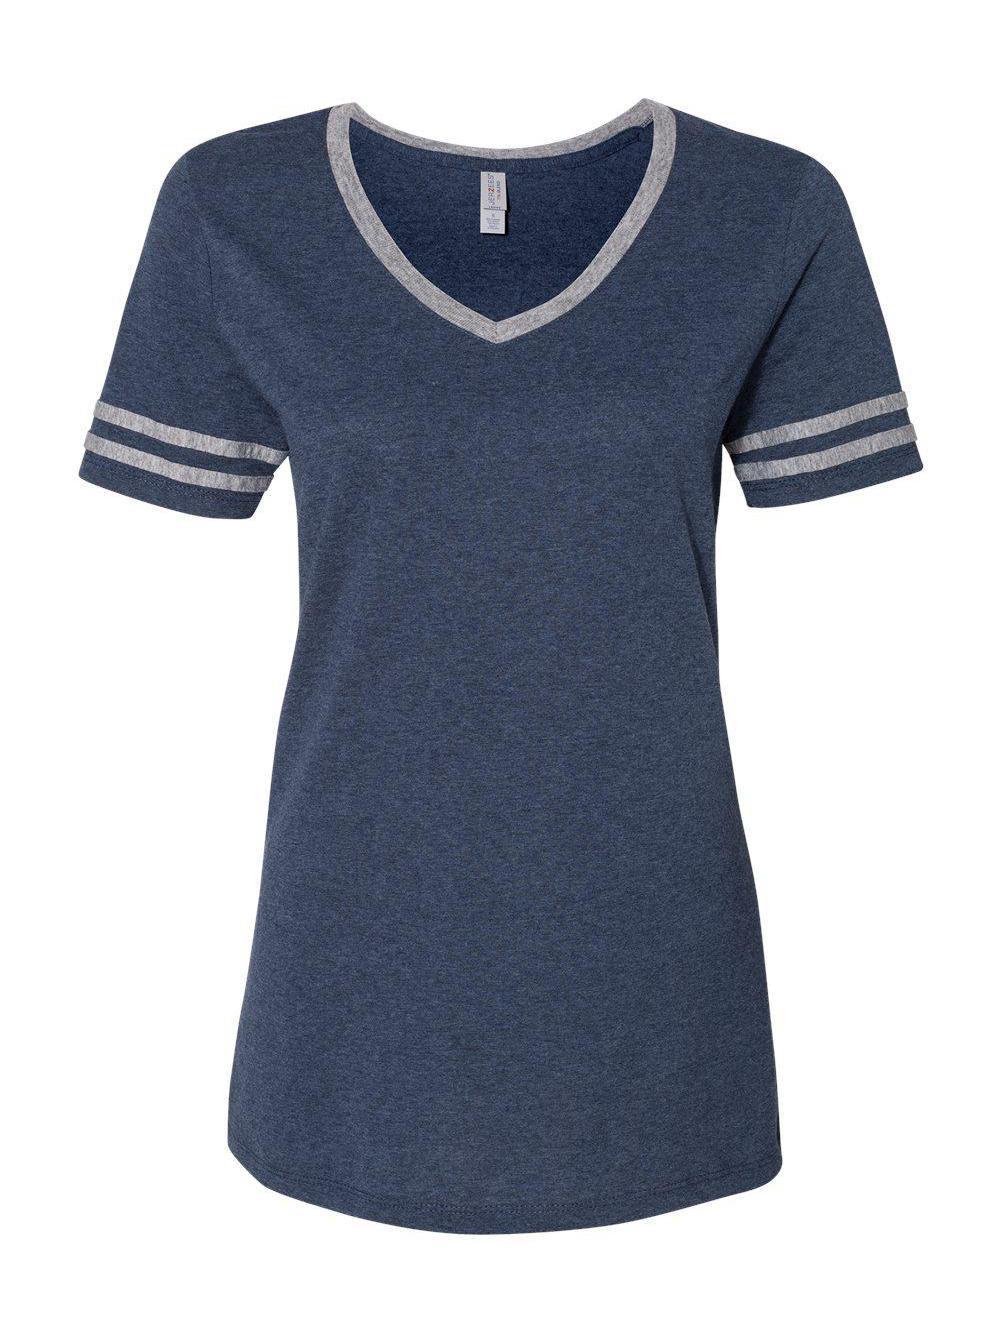 Jerzees-Triblend-Women-039-s-V-Neck-Varsity-T-Shirt-602WVR thumbnail 12